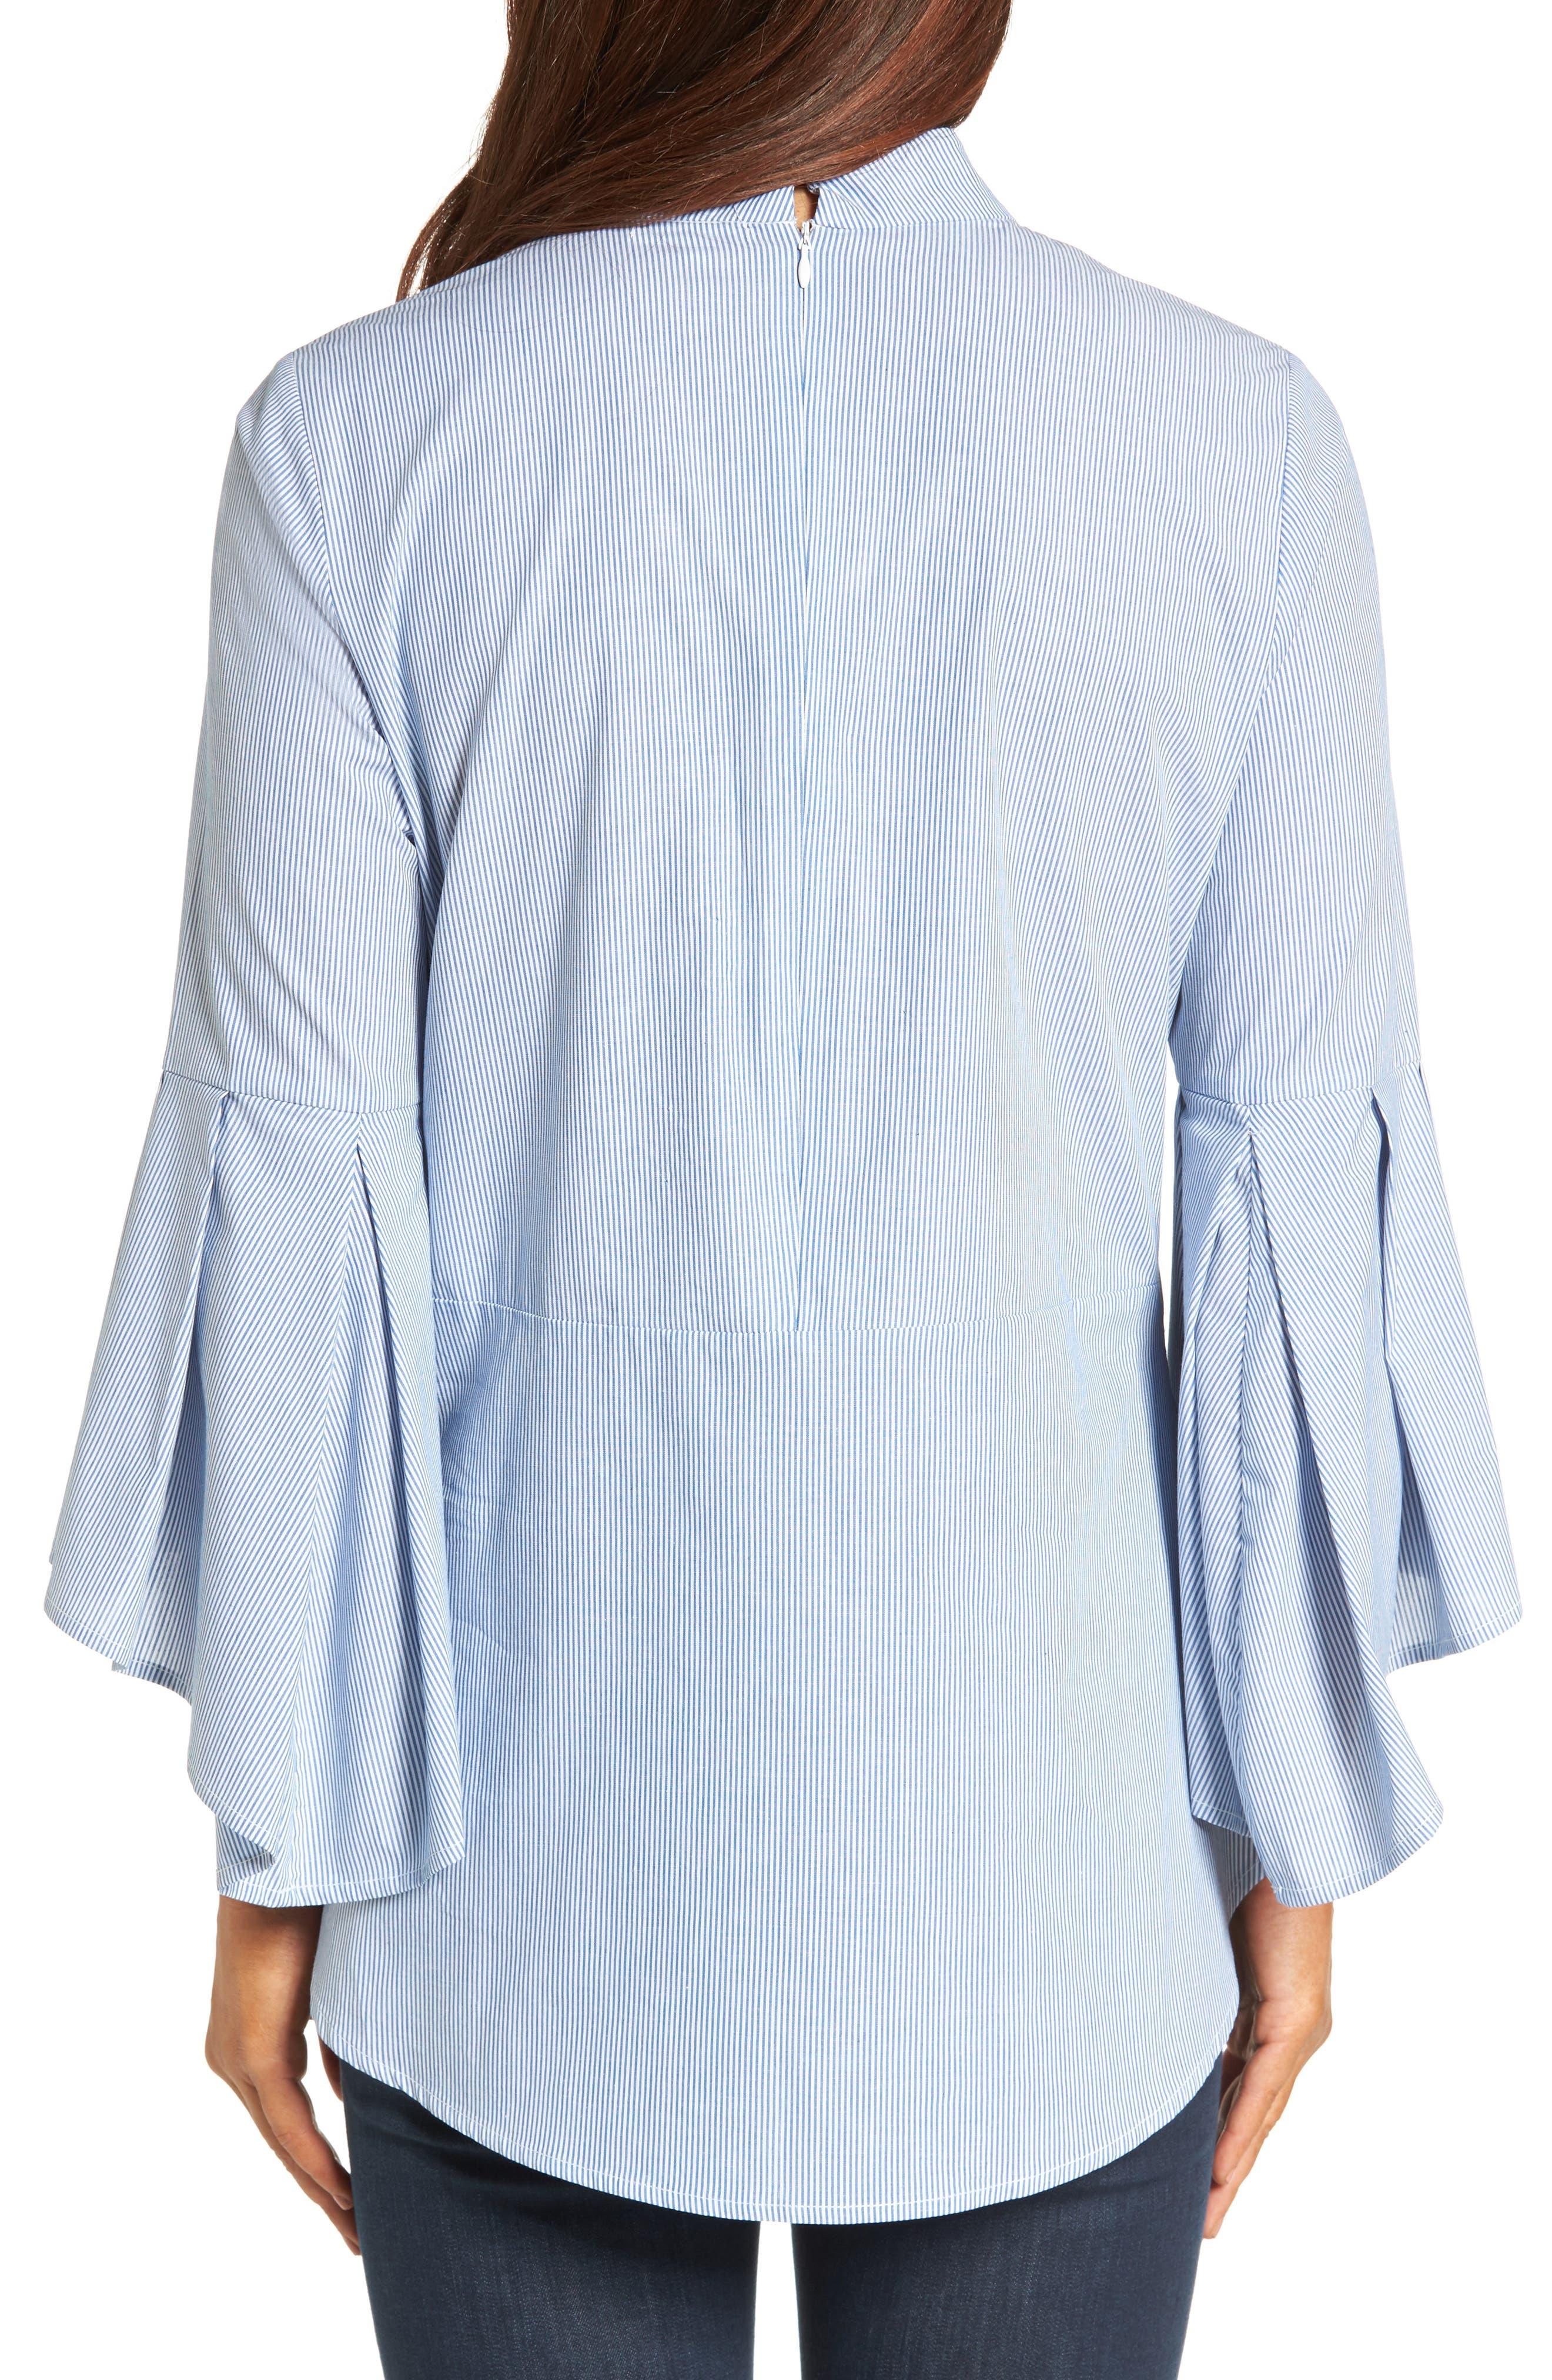 Ruffle Sleeve Poplin Shirt,                             Alternate thumbnail 3, color,                             Blue/ White Stripe